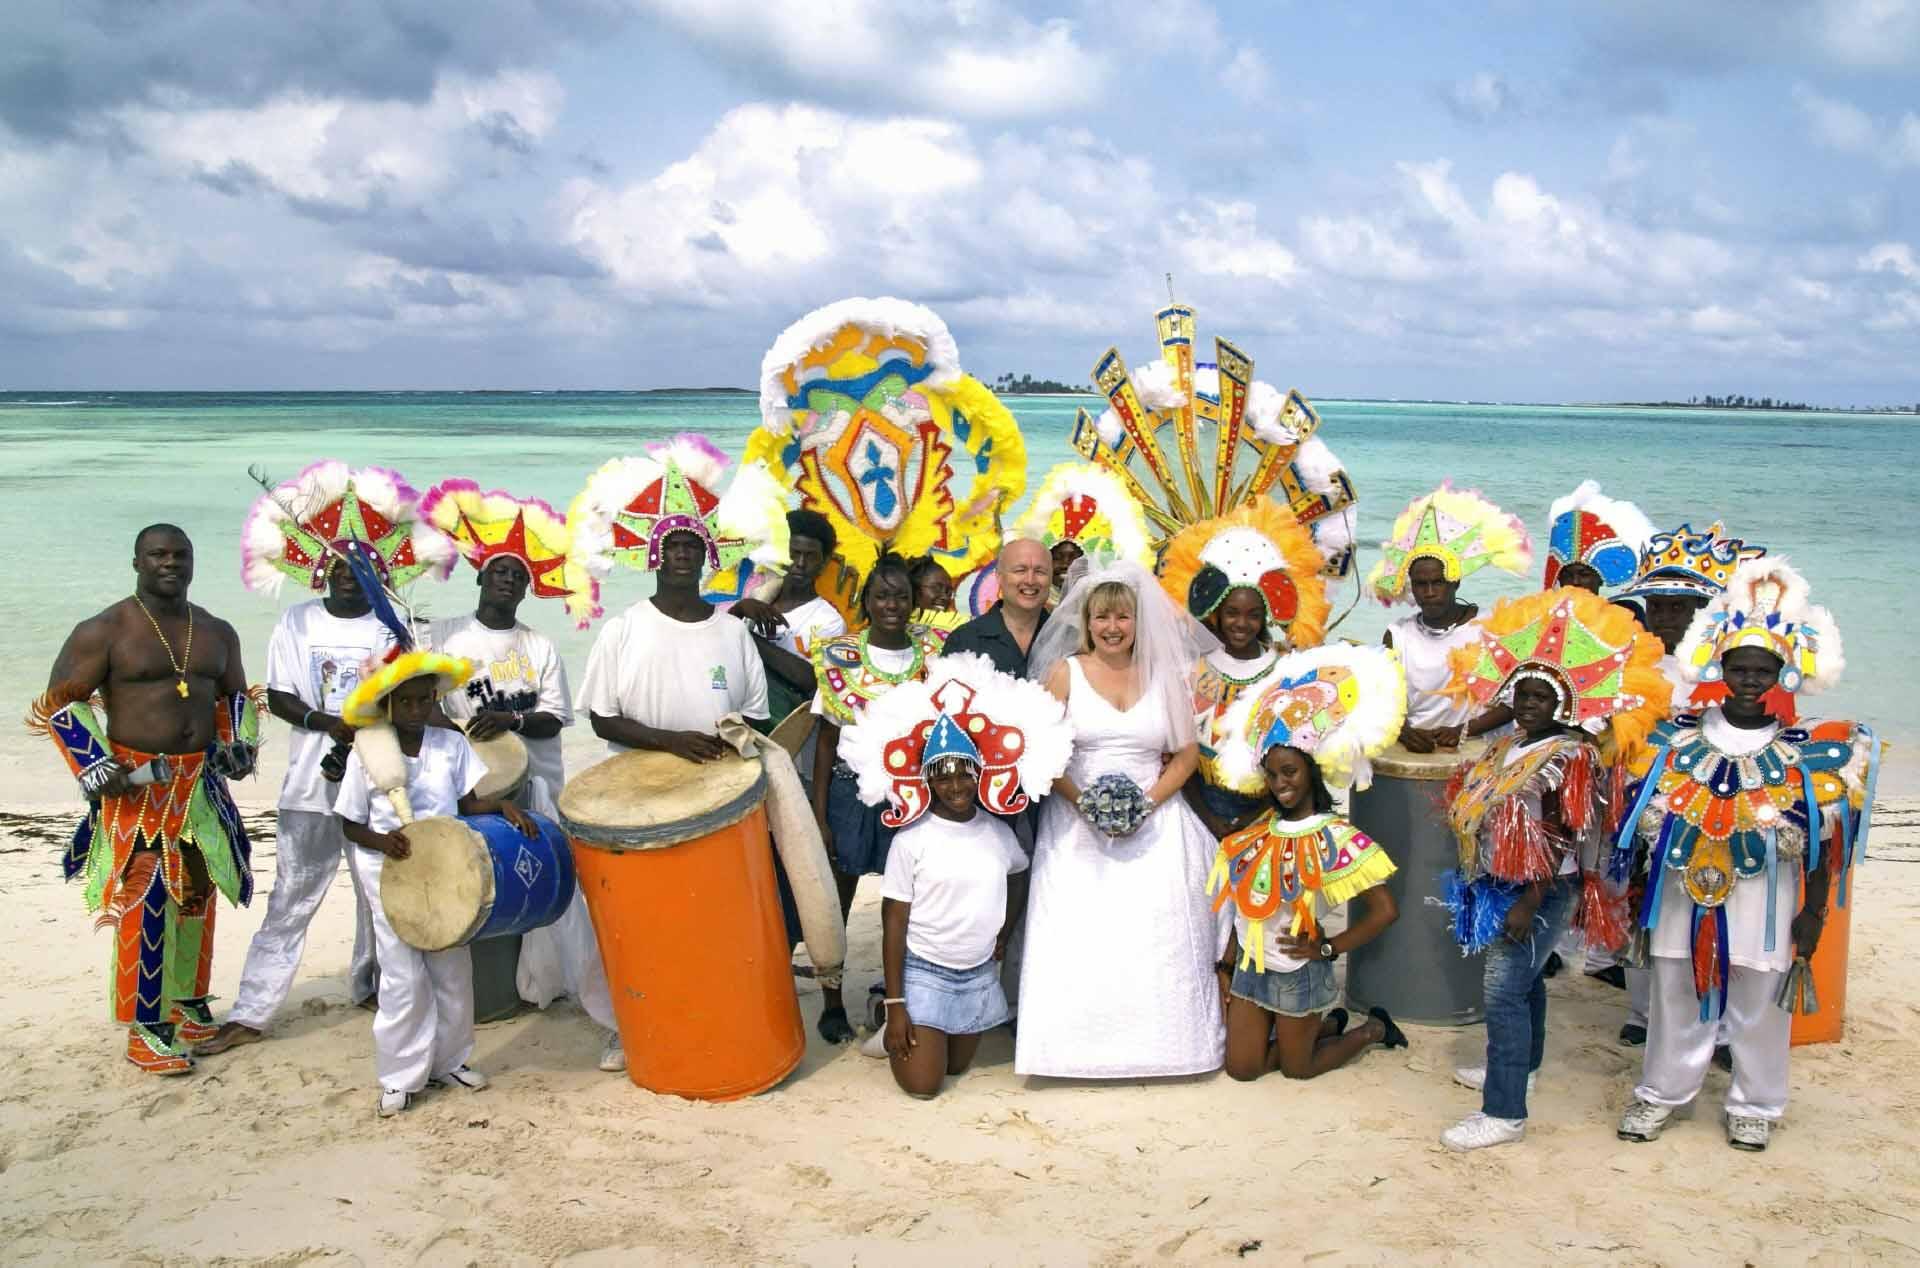 bahamas, abaco, green turtle cay, new plymouth, destination wedding, junkanoo, gillam bay, amanda diedrick